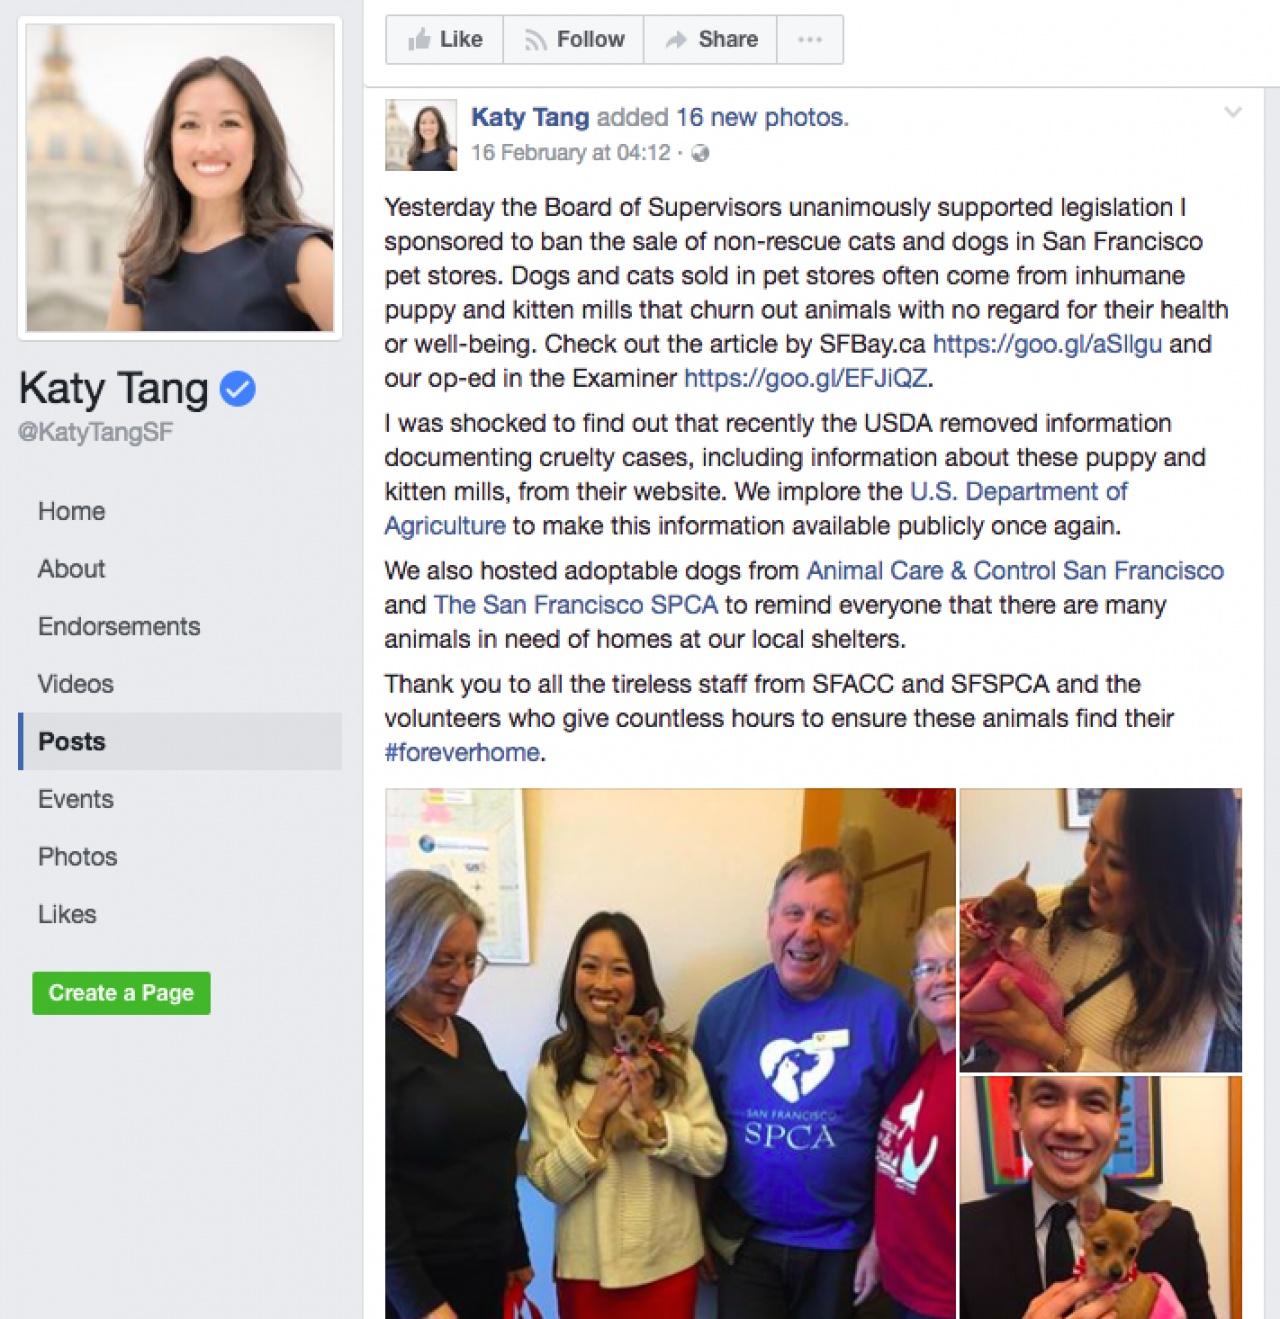 Katy Tang以捍衛動物權益為人熟悉,她同時是幾頭小狗的寄養家庭。(Katy Tang Facebook)